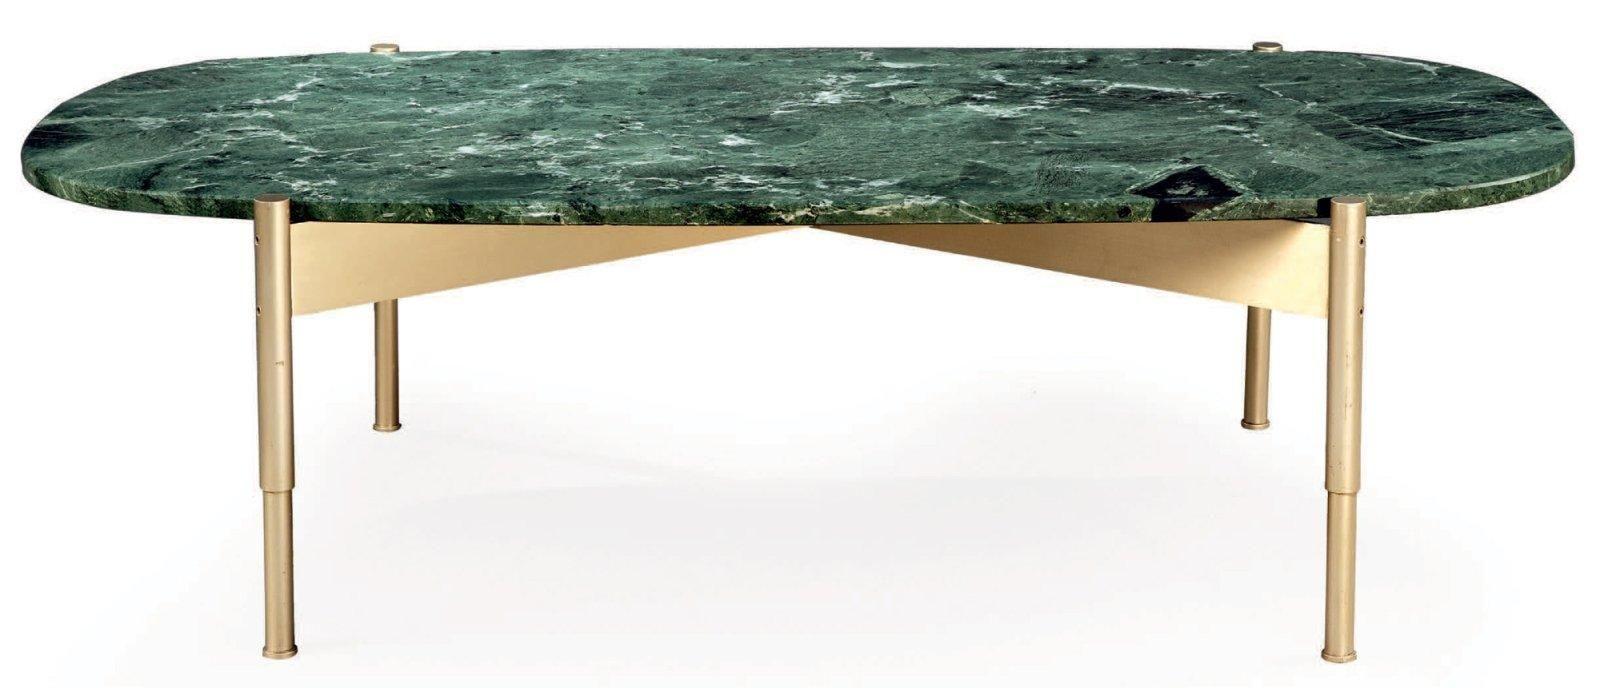 gio ponti 1891 1979 table basse marbre vert et aluminium anodis 1964 mobilier pinterest. Black Bedroom Furniture Sets. Home Design Ideas